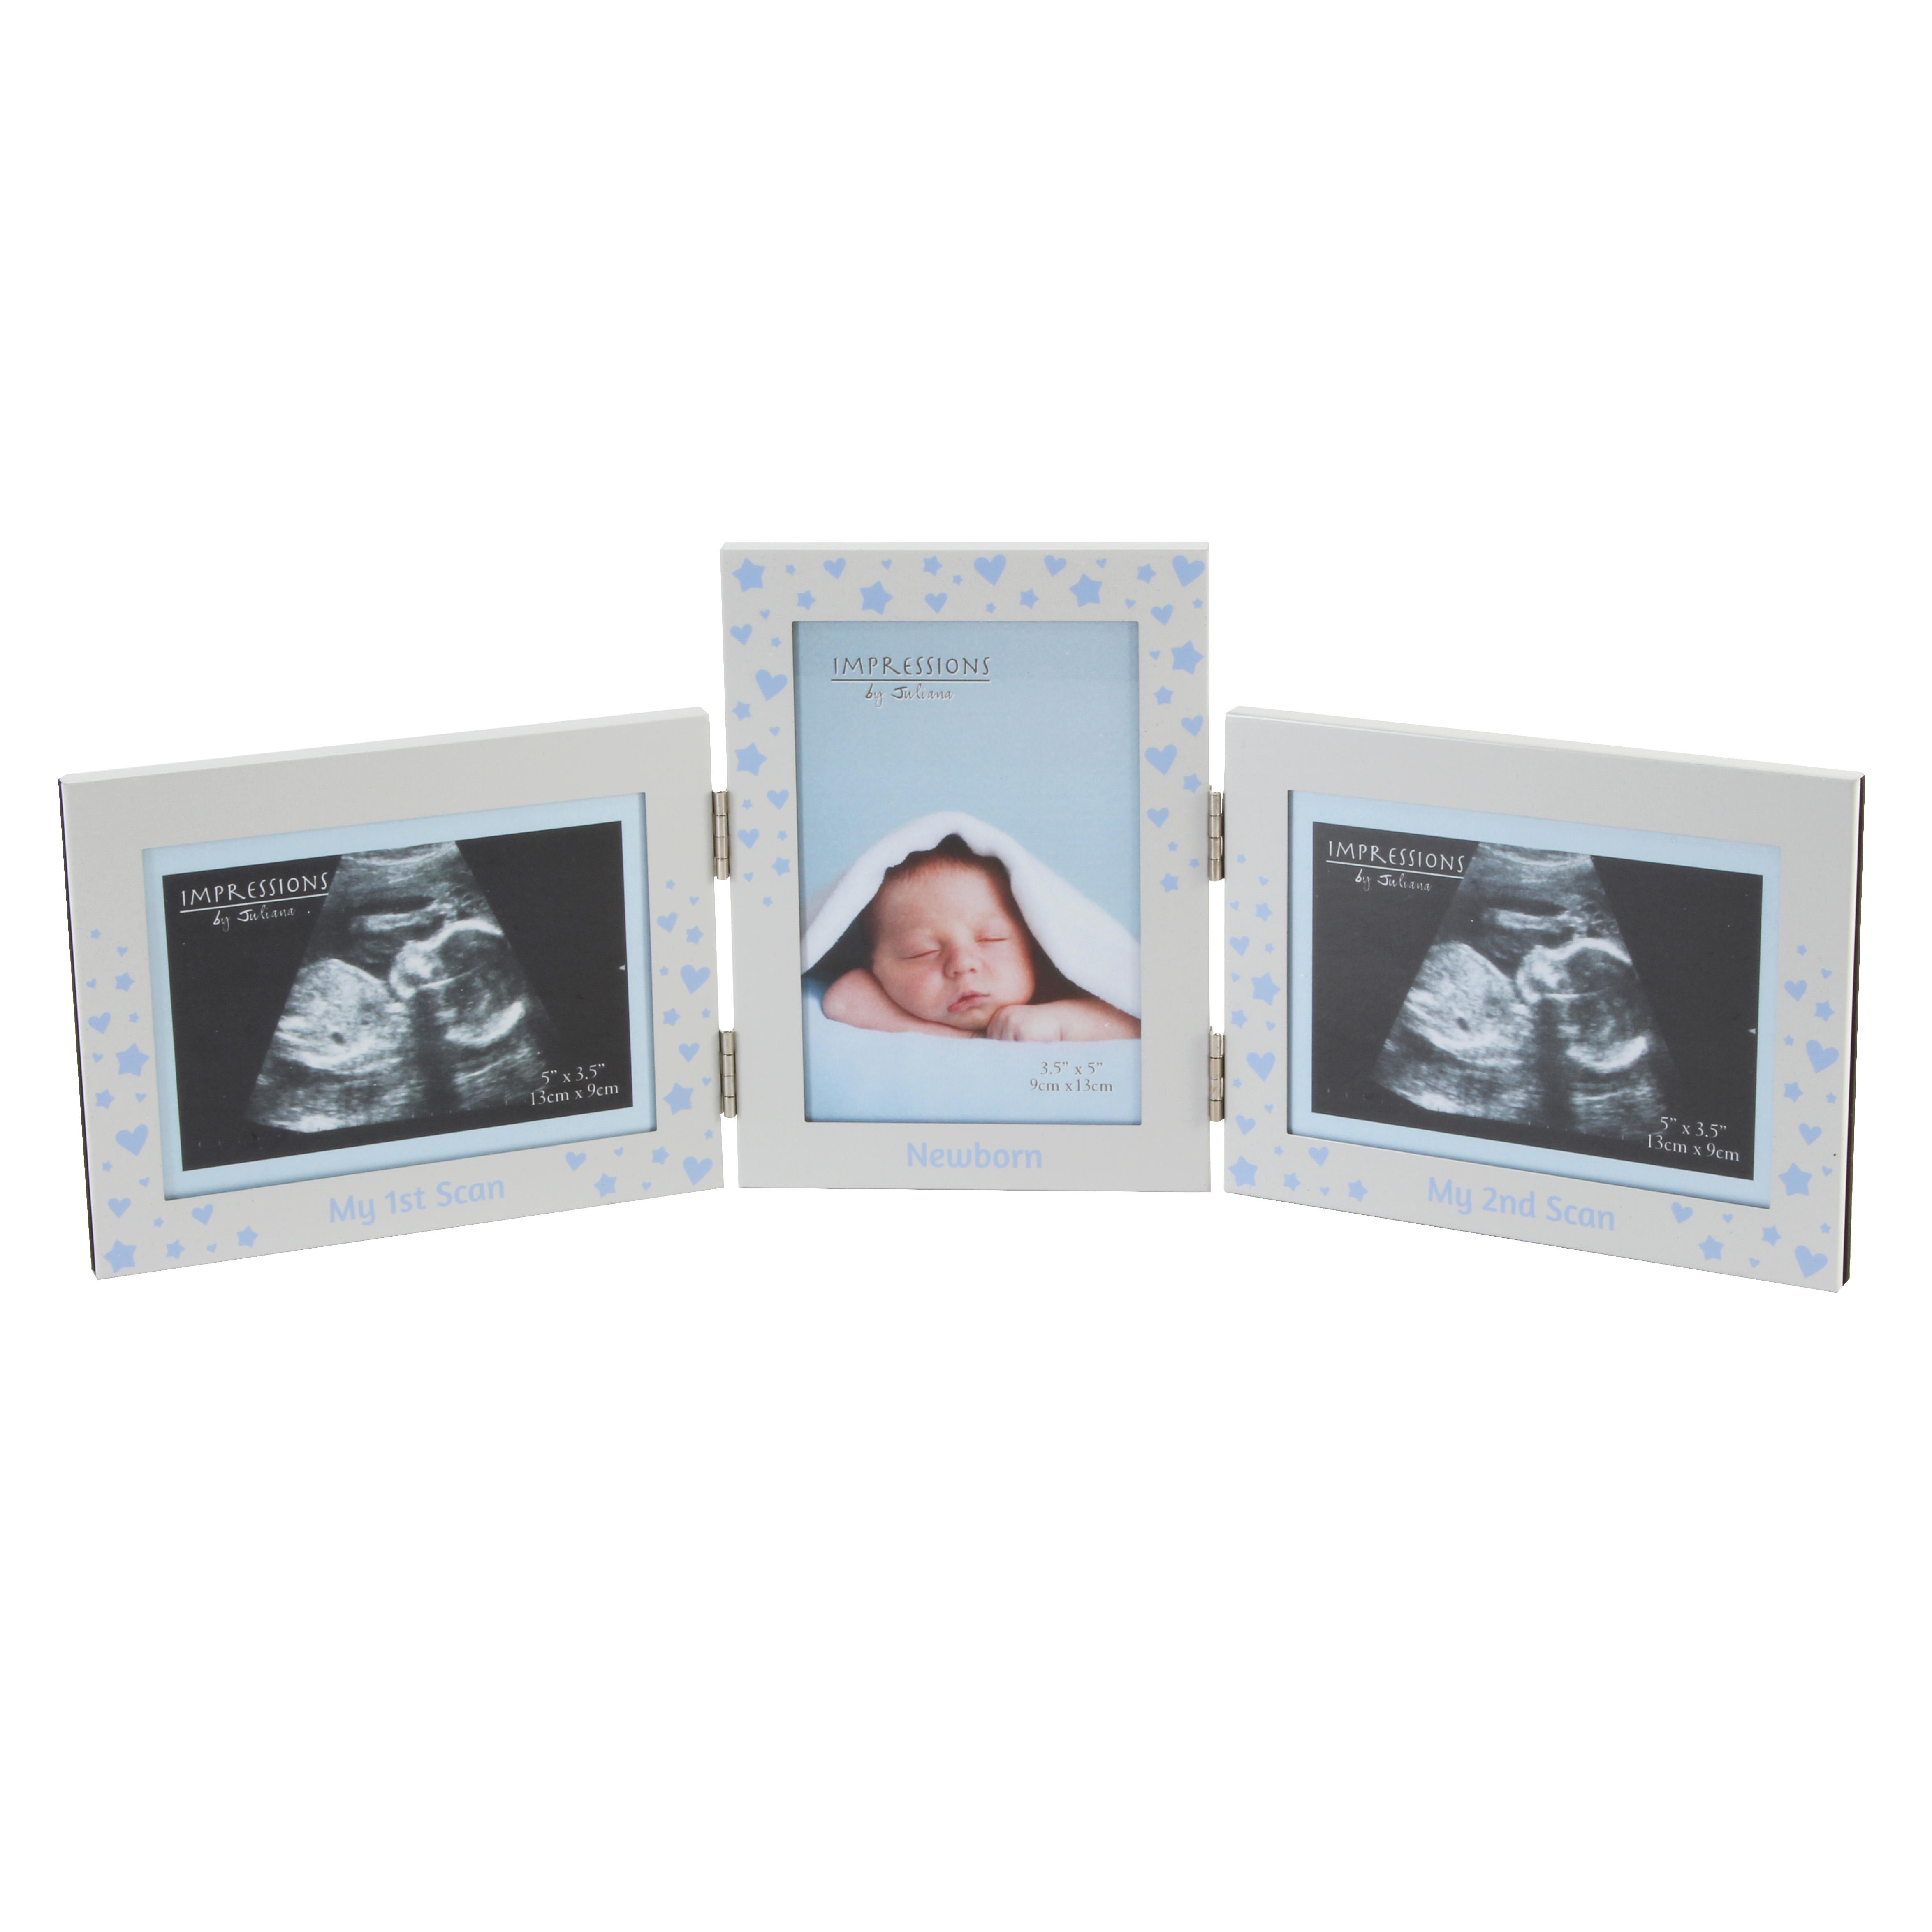 Ultraschall Fotorahmen 3 teilig in Blau 3 Stück 13x9cm Baby ...